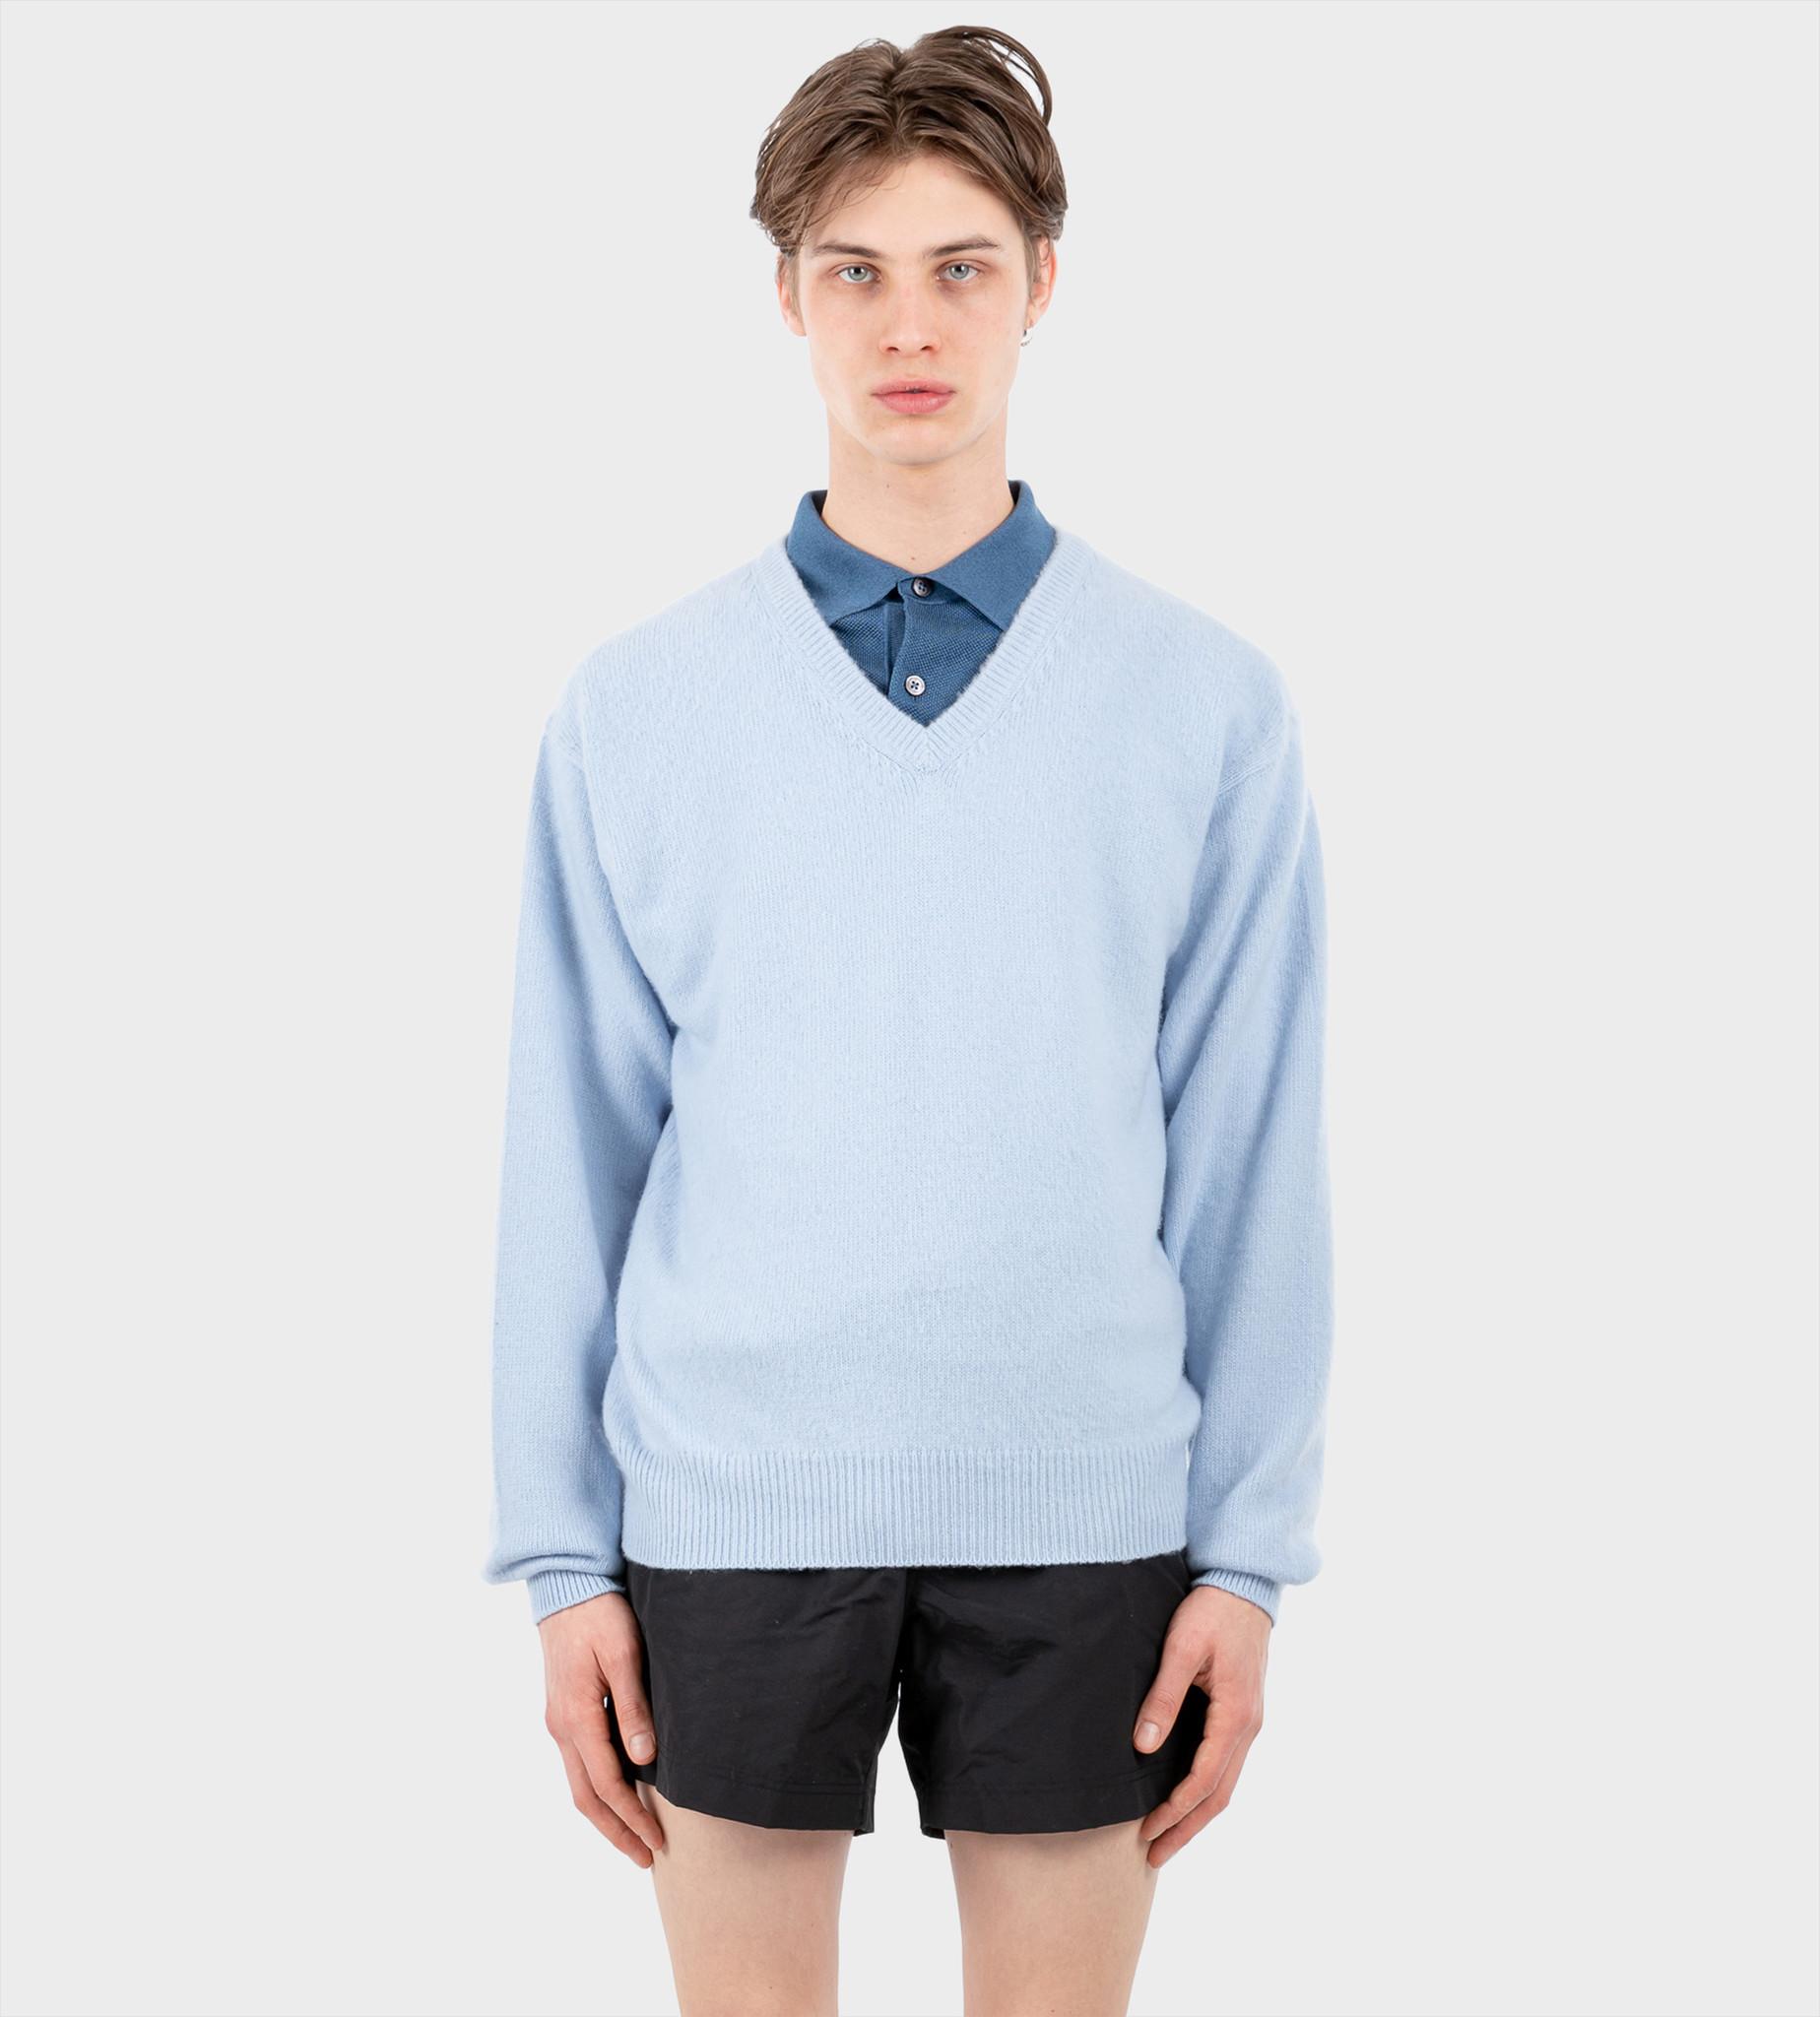 TOM FORD V-Neck Knitwear Blue